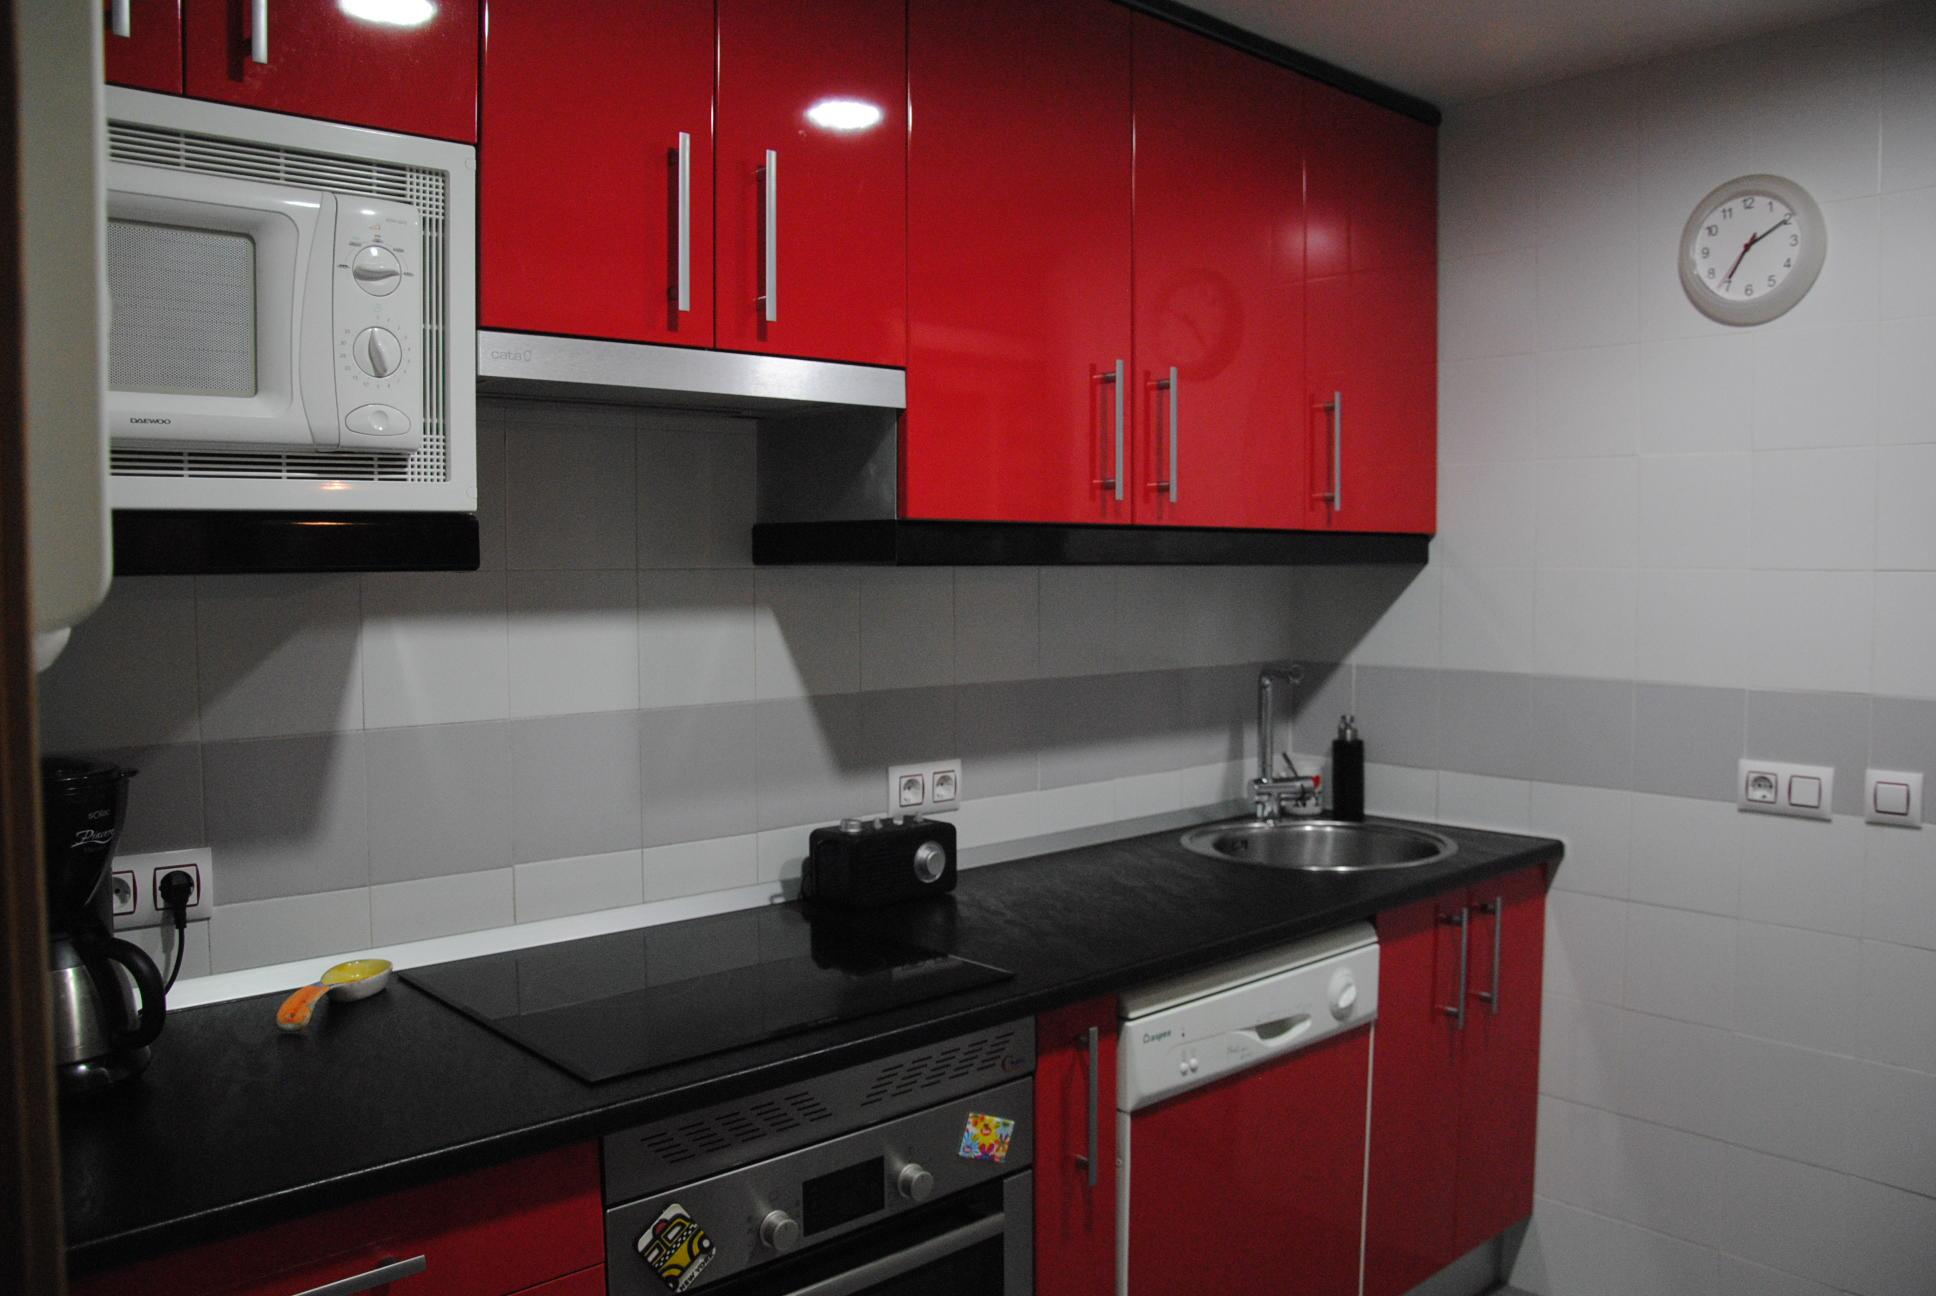 laminado alto brillo rojo ferrari, remates en negro, encimera glp 283 tf p7